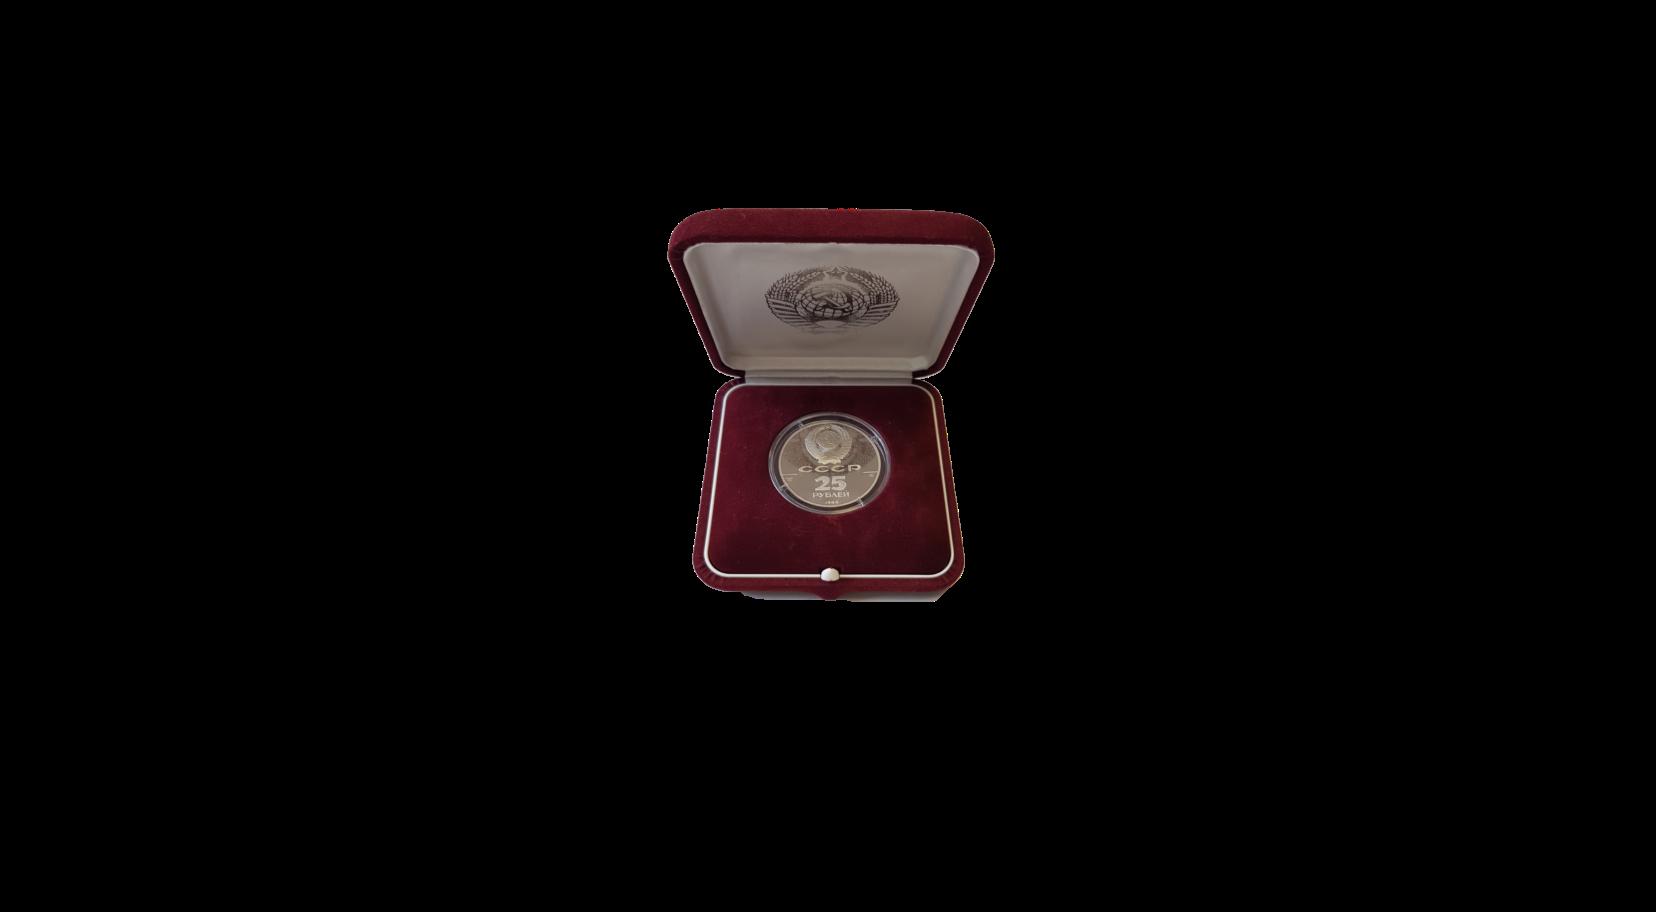 1 Unze (oz) 25 Rubel Palladiummünzen